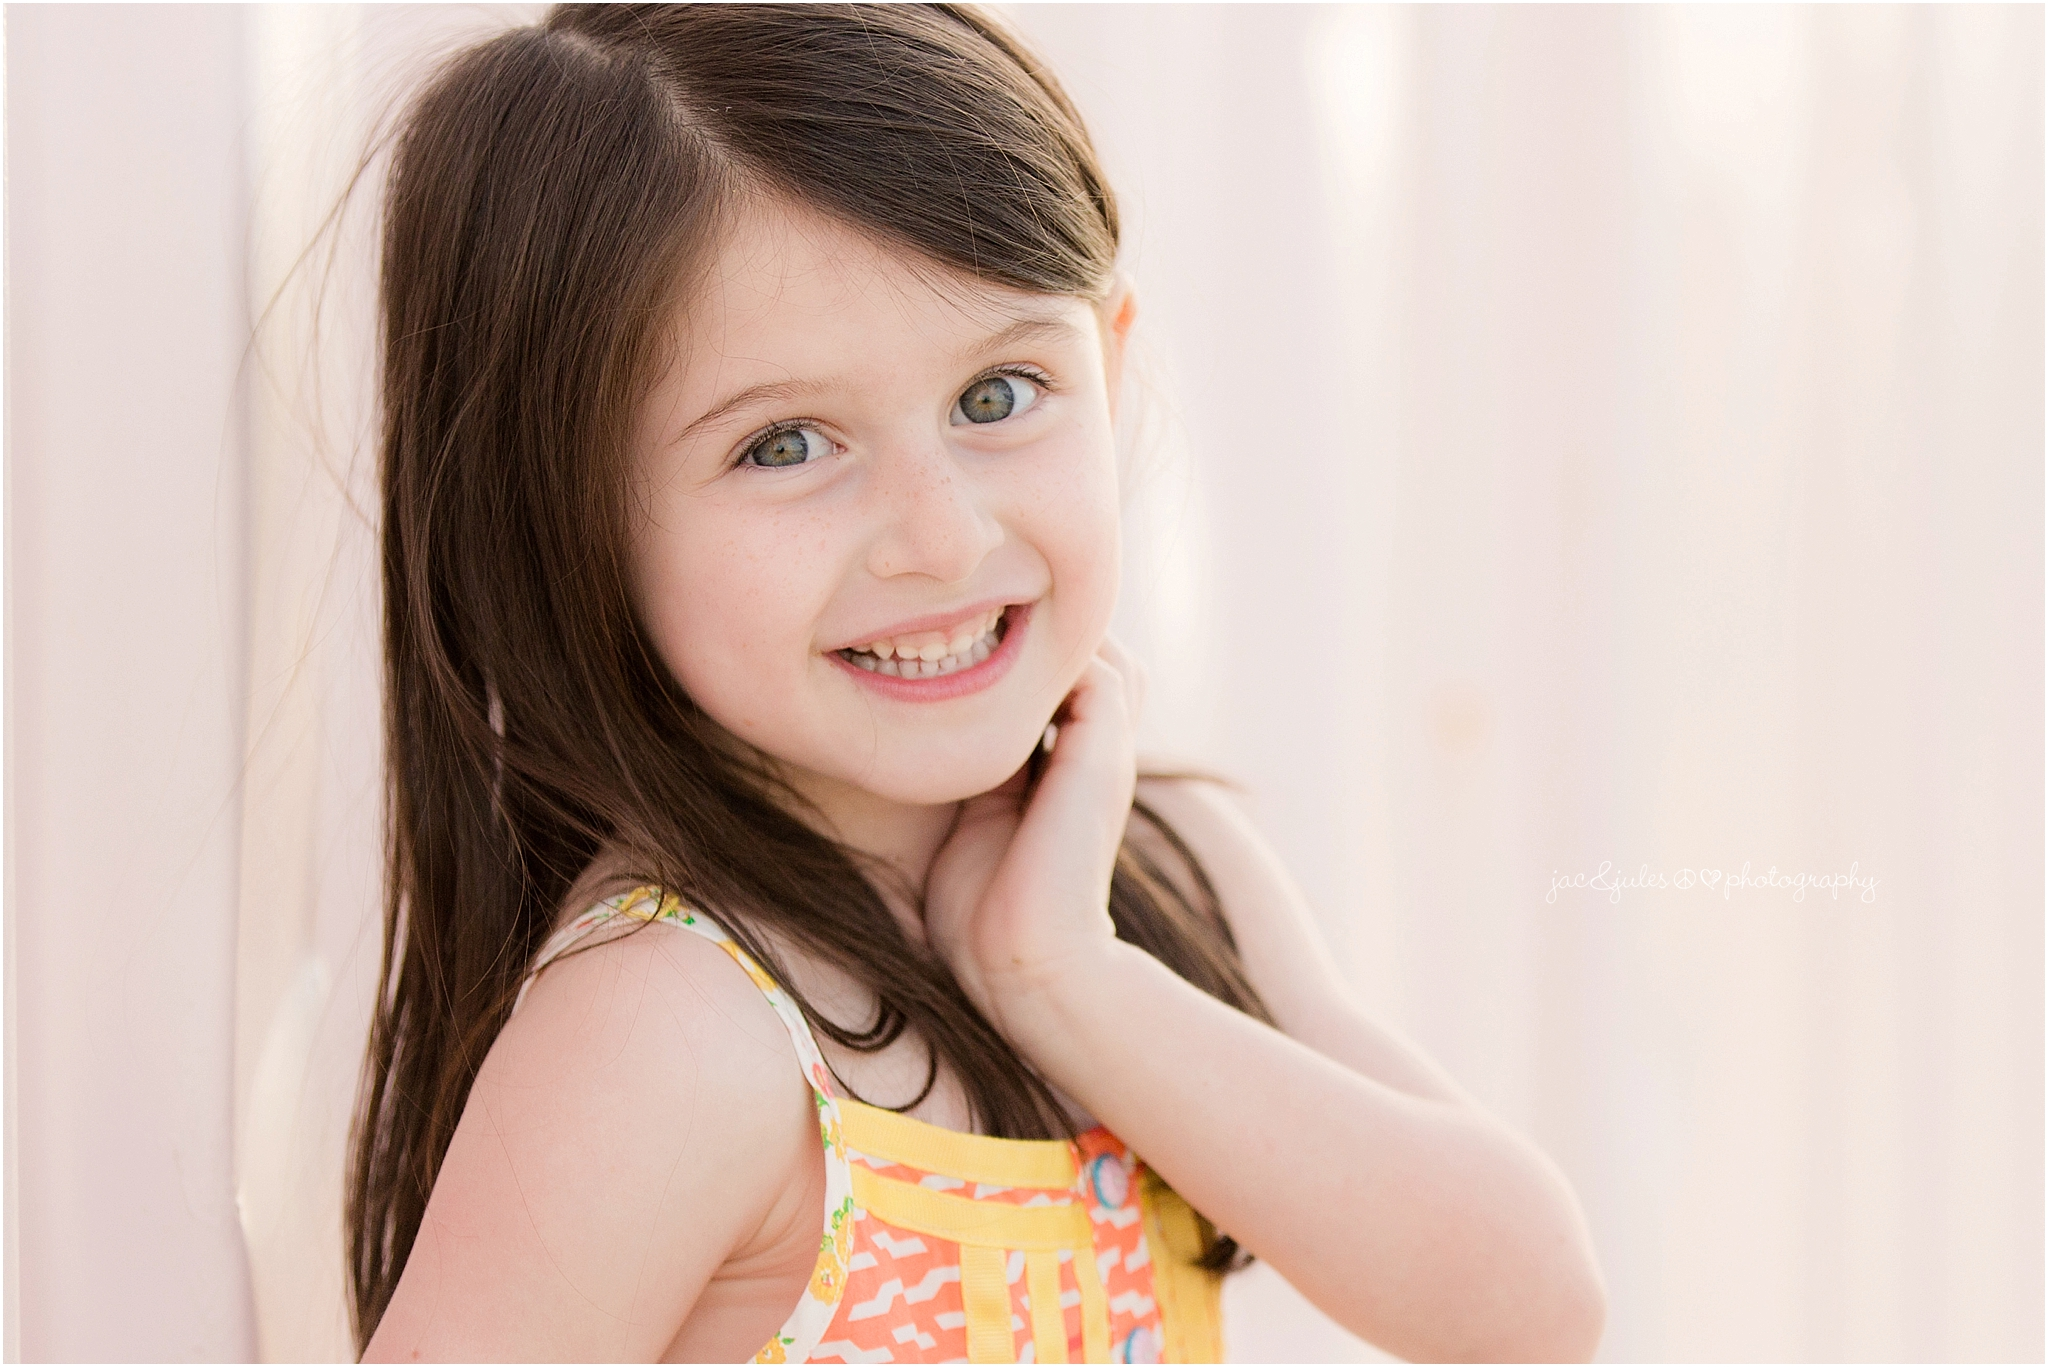 jacnjules photographs children in Asbury Park NJ